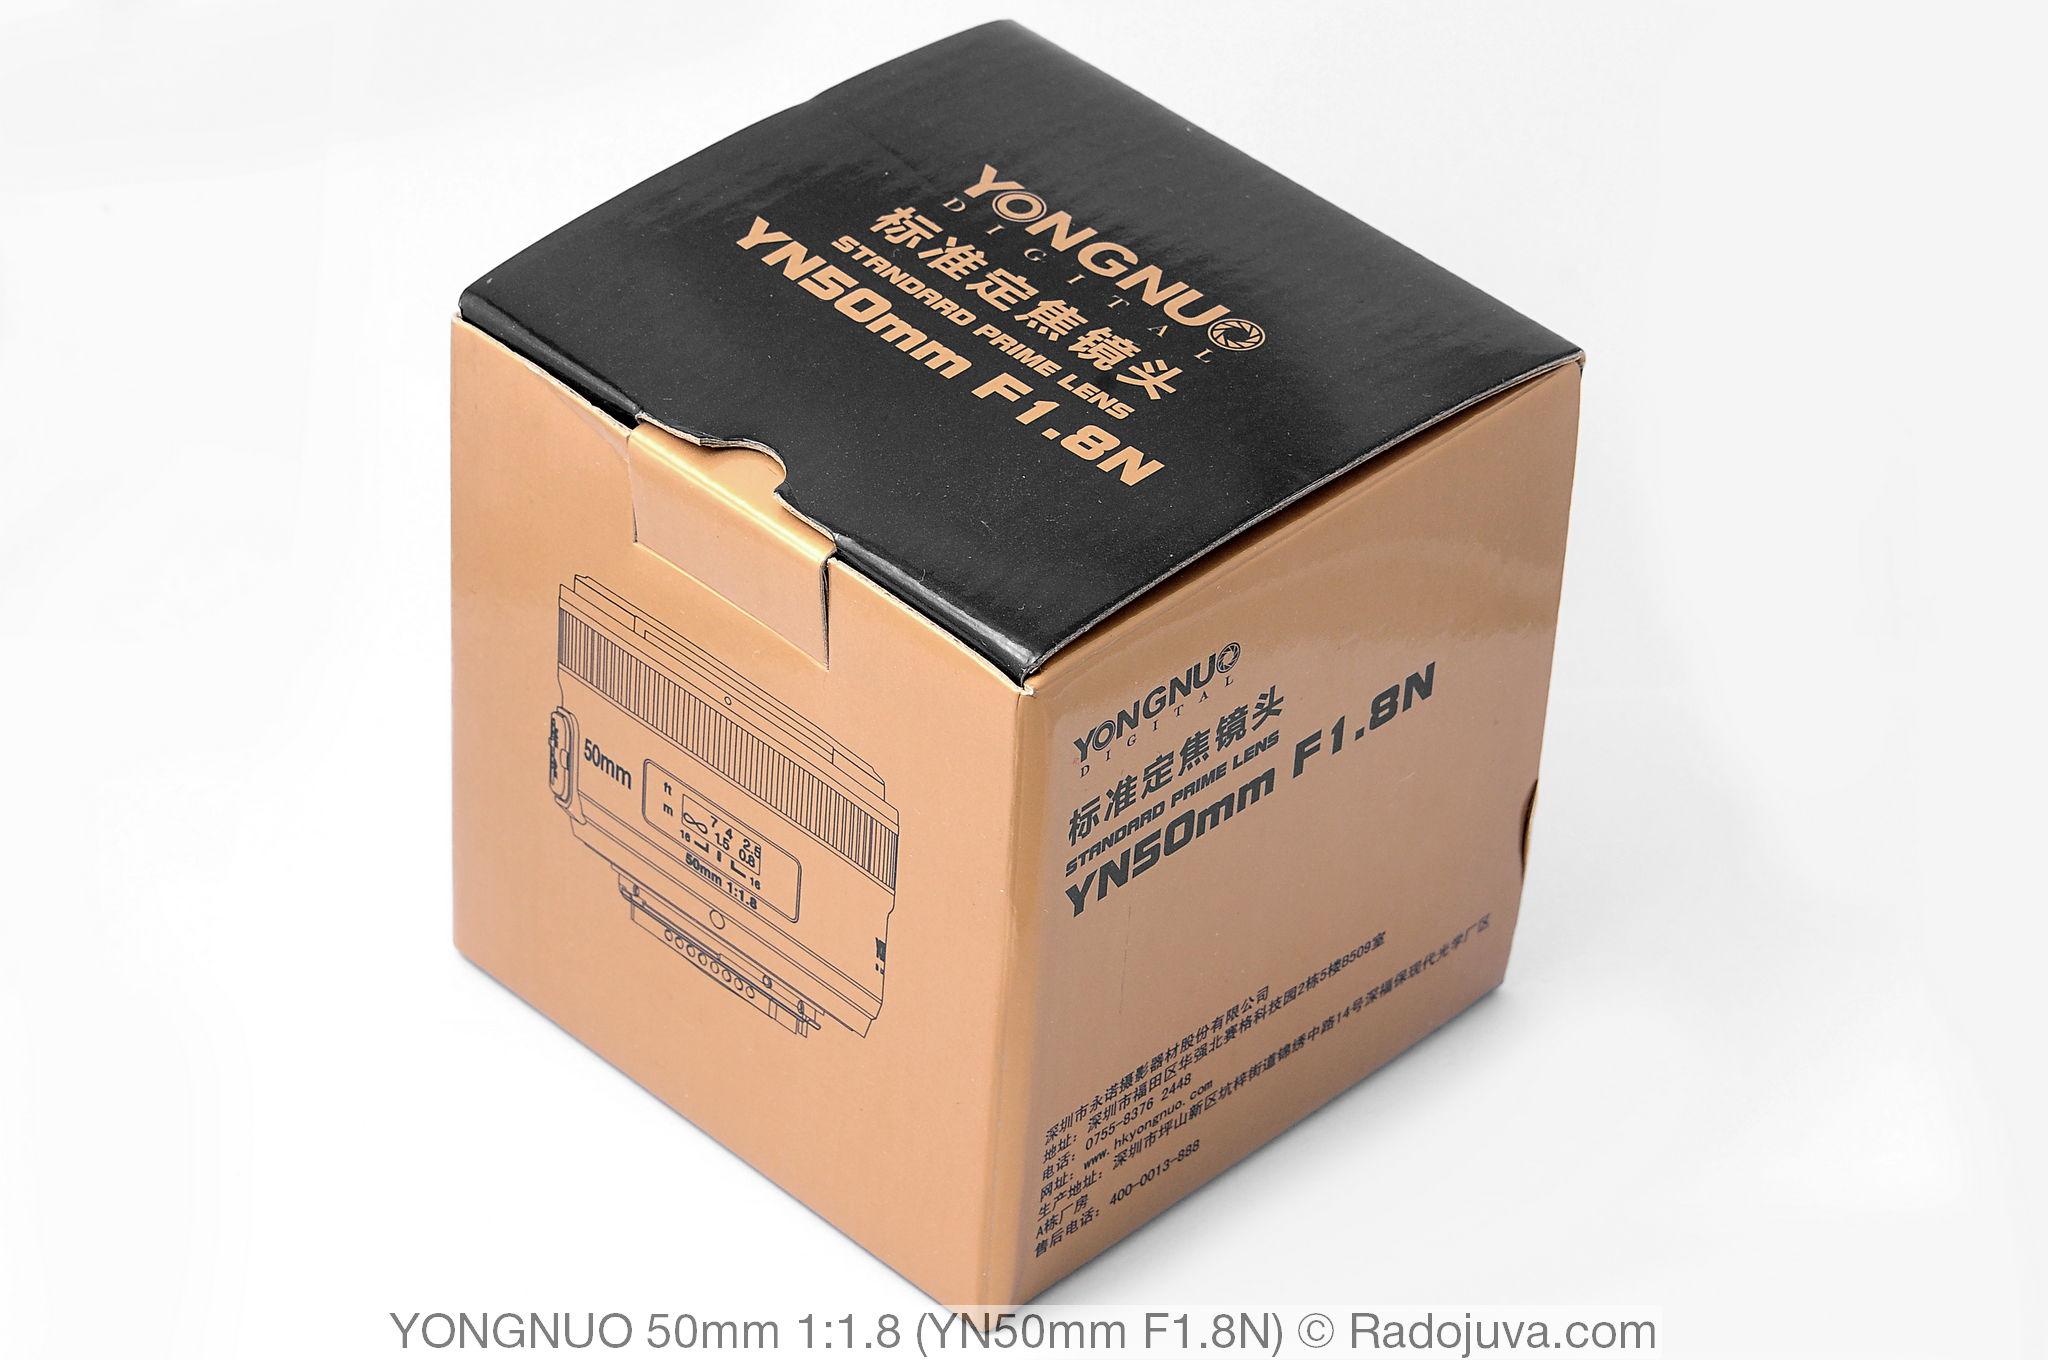 Коробка объектива Yongnuo 50mm 1:1.8 (YN50mm F1.8N)